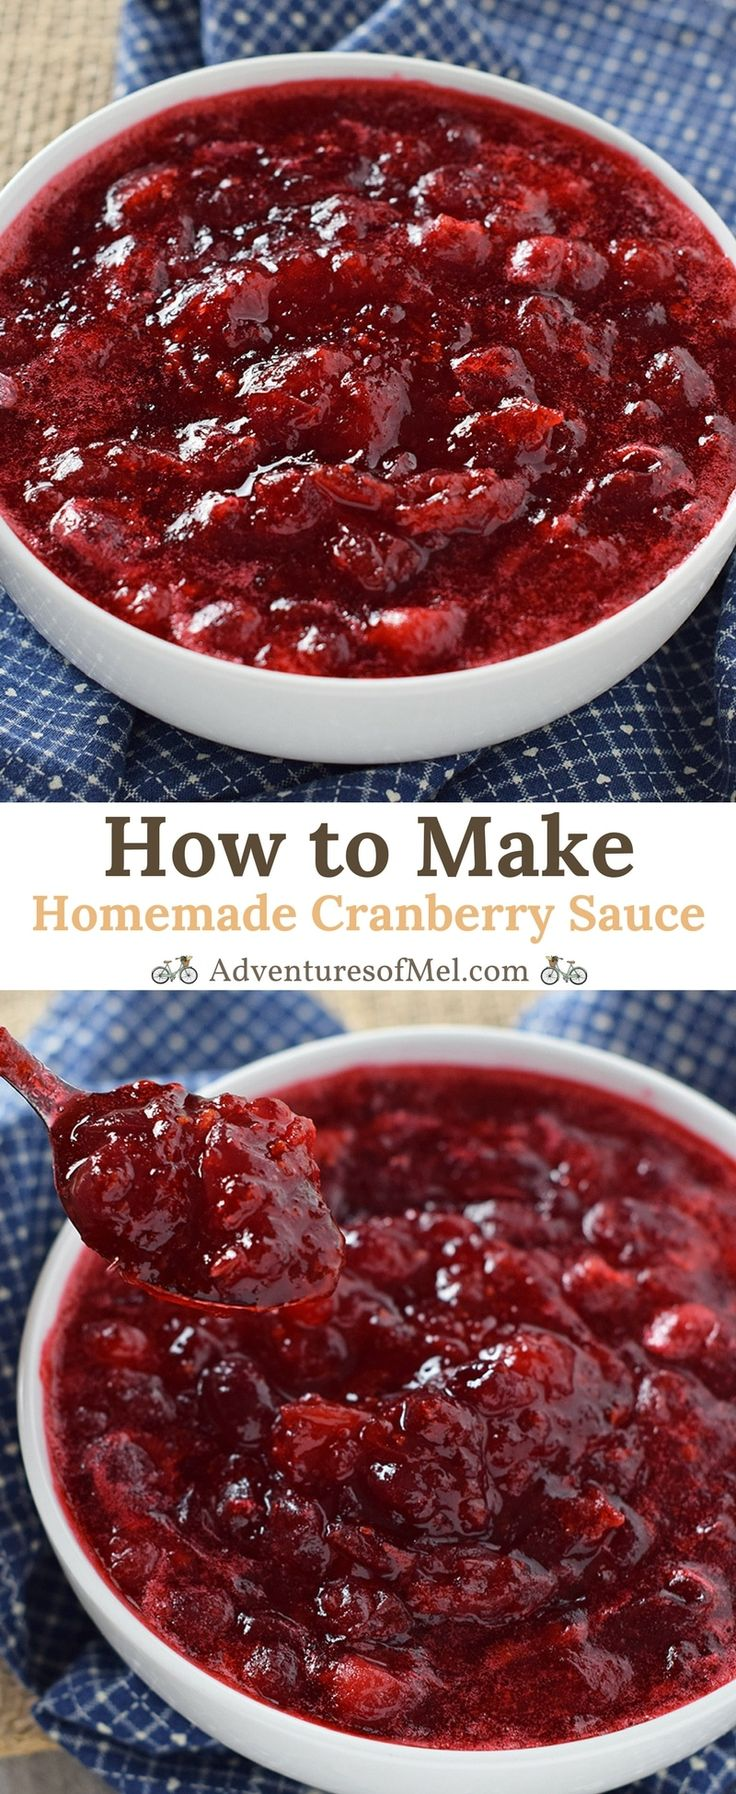 Homemade Cranberry Sauce made from scratch using fresh